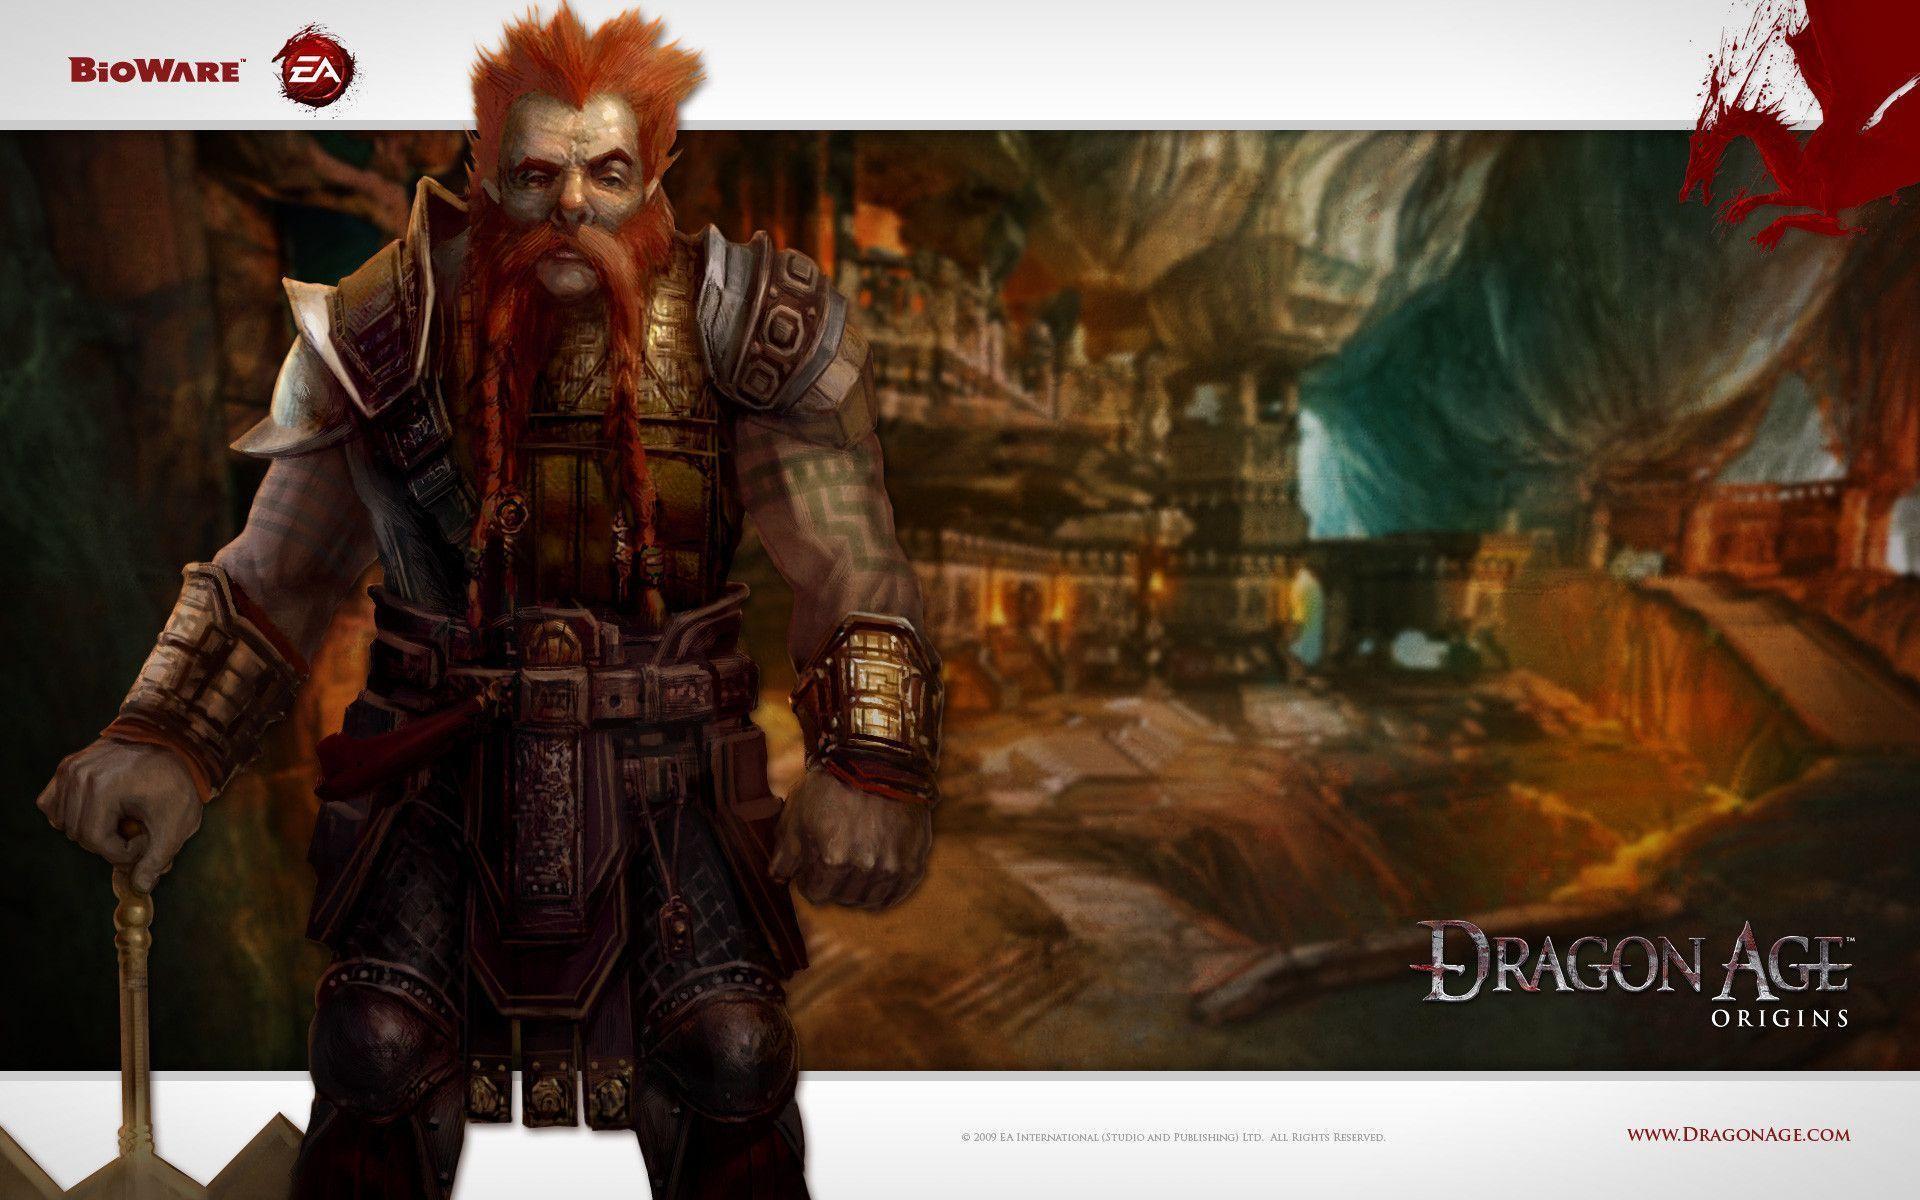 Geography Hd Wallpaper Dragon Age Origins Wallpapers Hd Wallpaper Cave